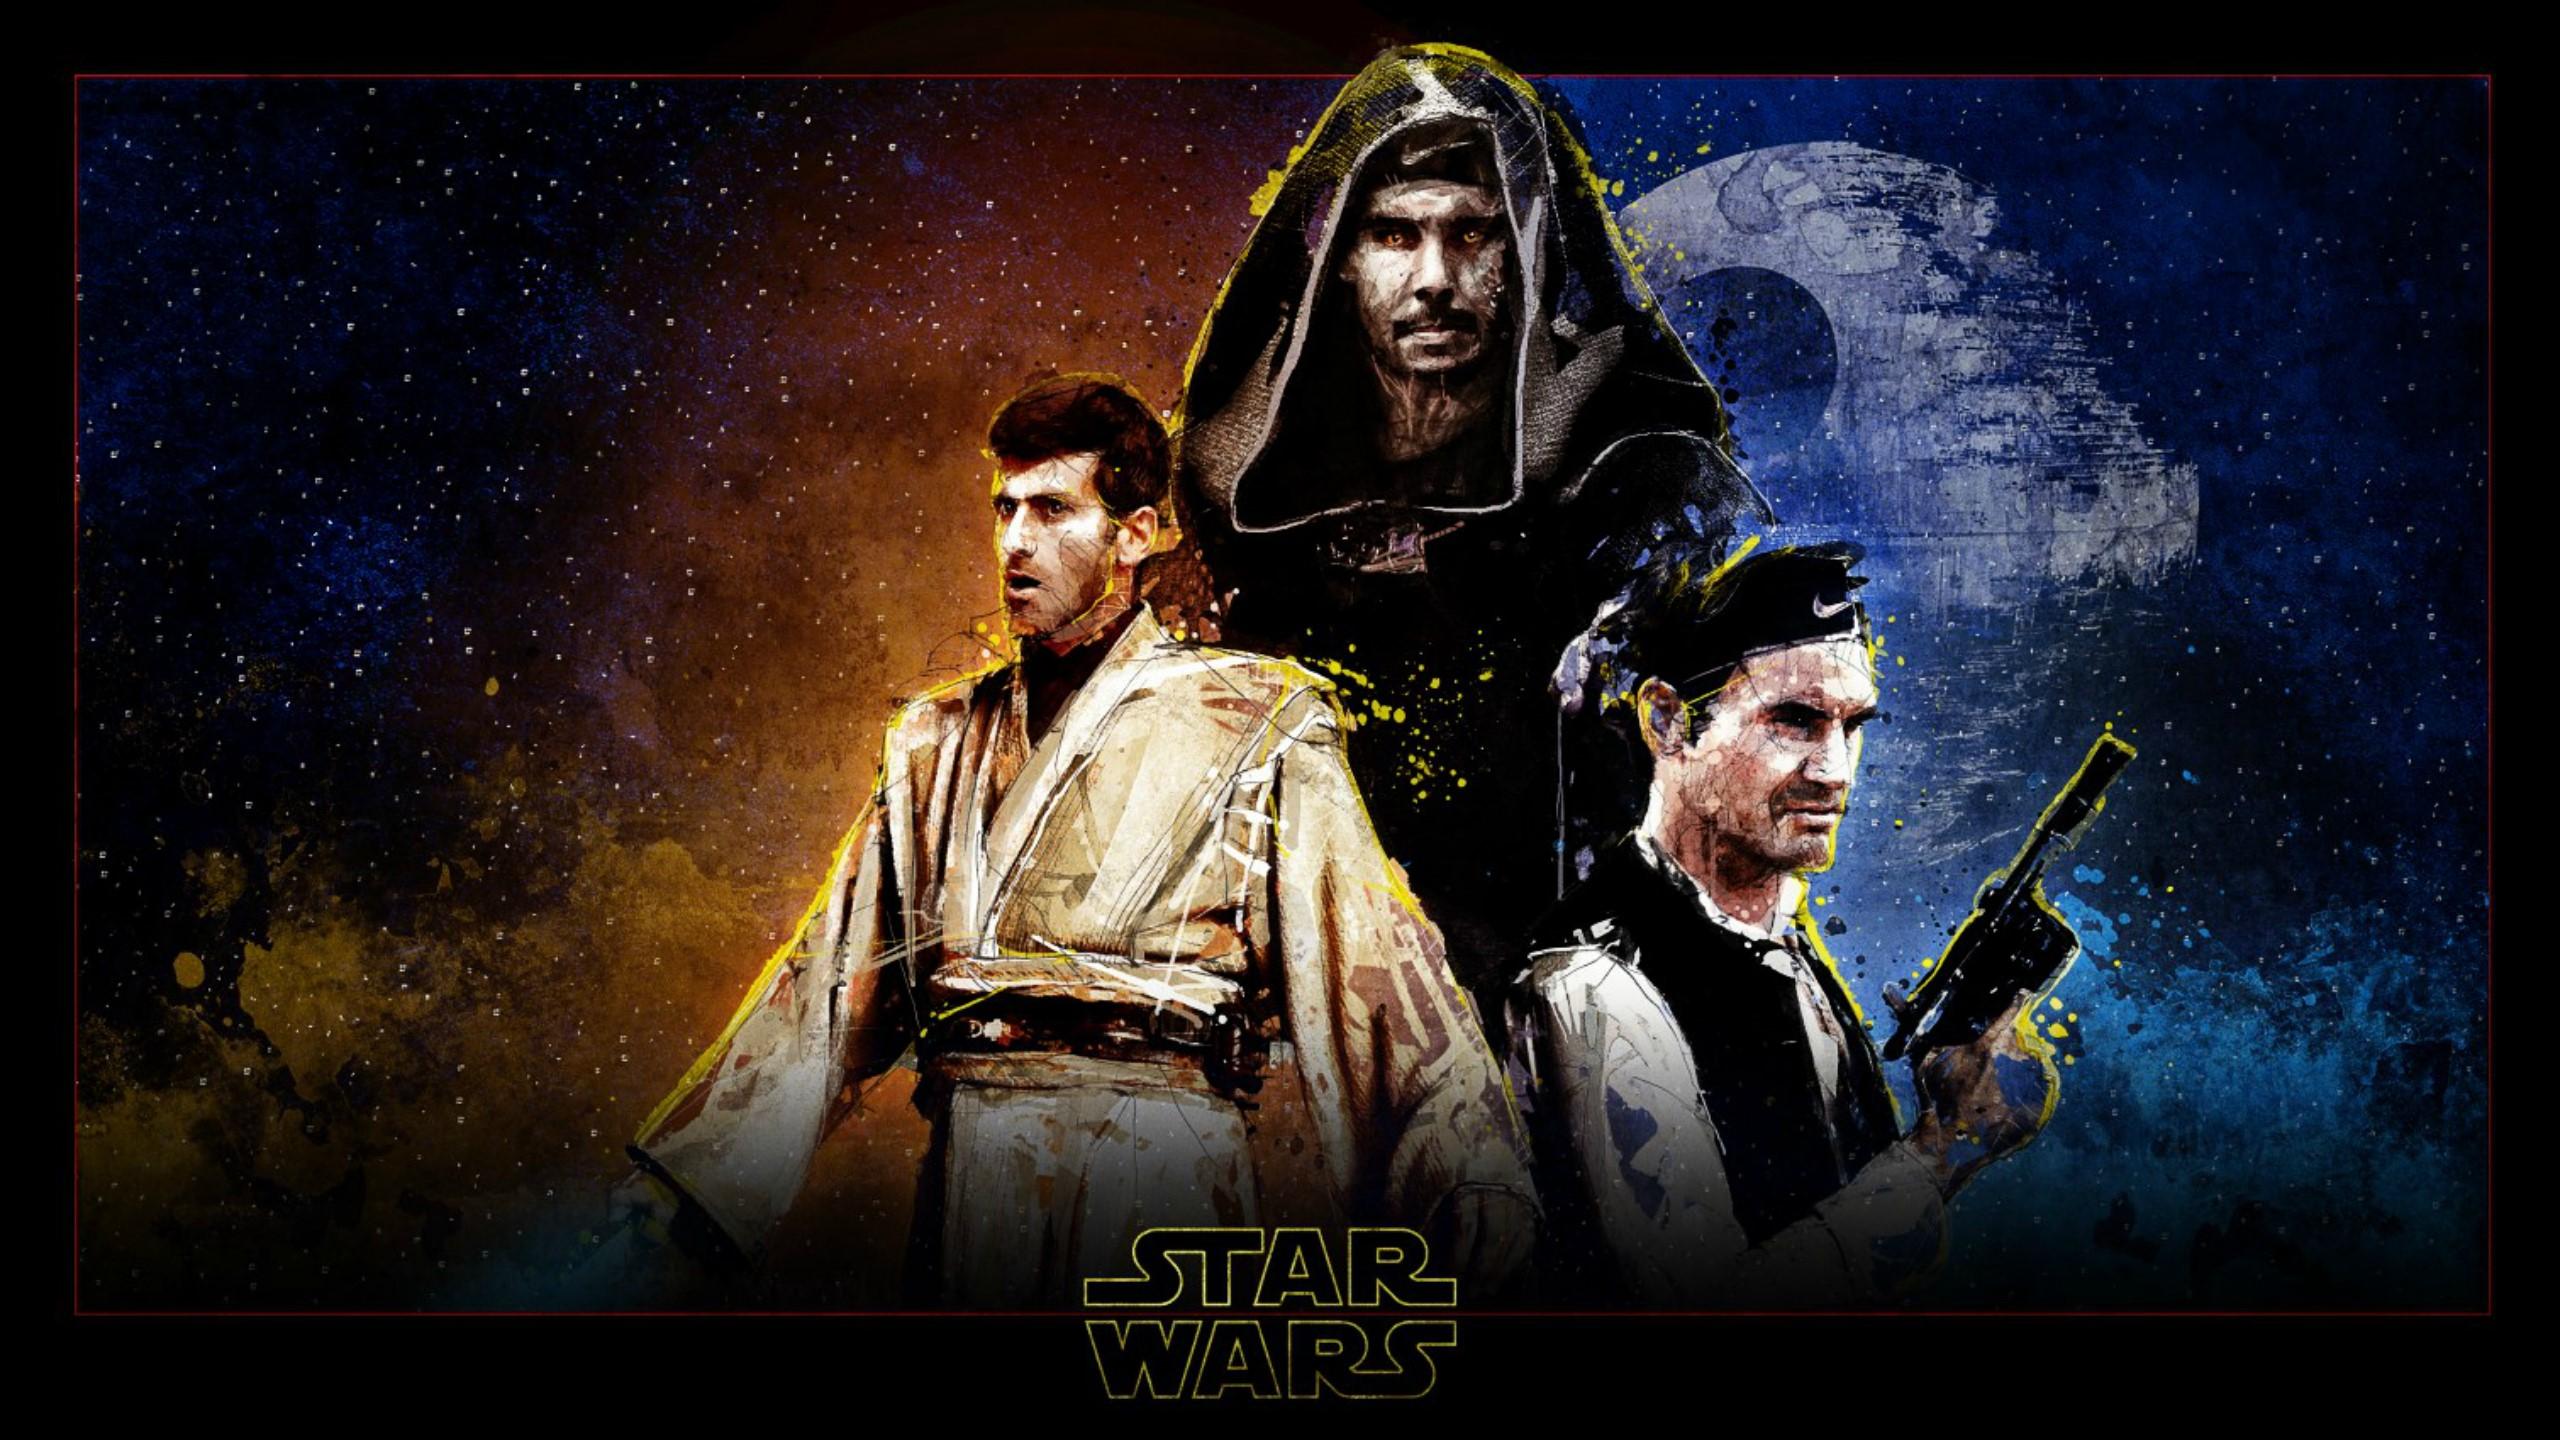 Star Wars: The emperor Nadal plus jedi Djokovic and captain Federer